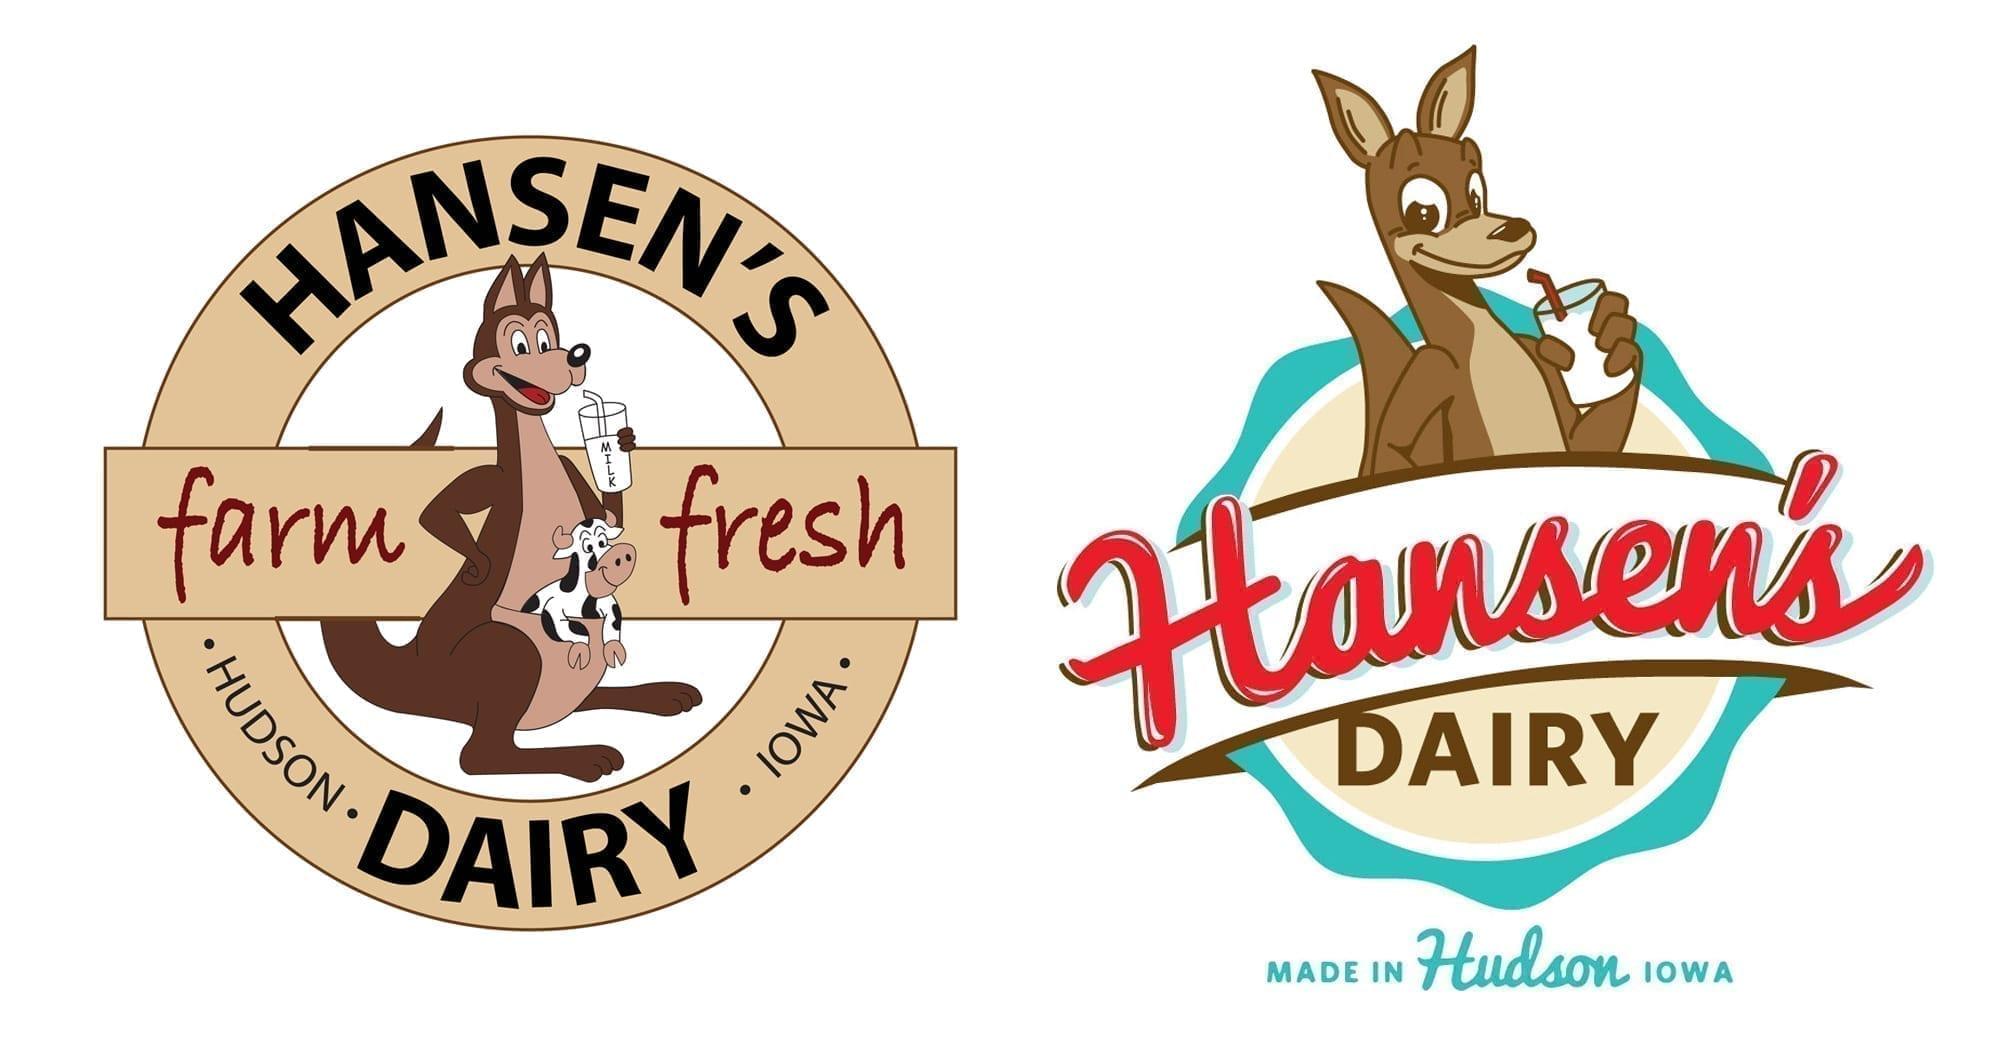 Hansen-seal-logo